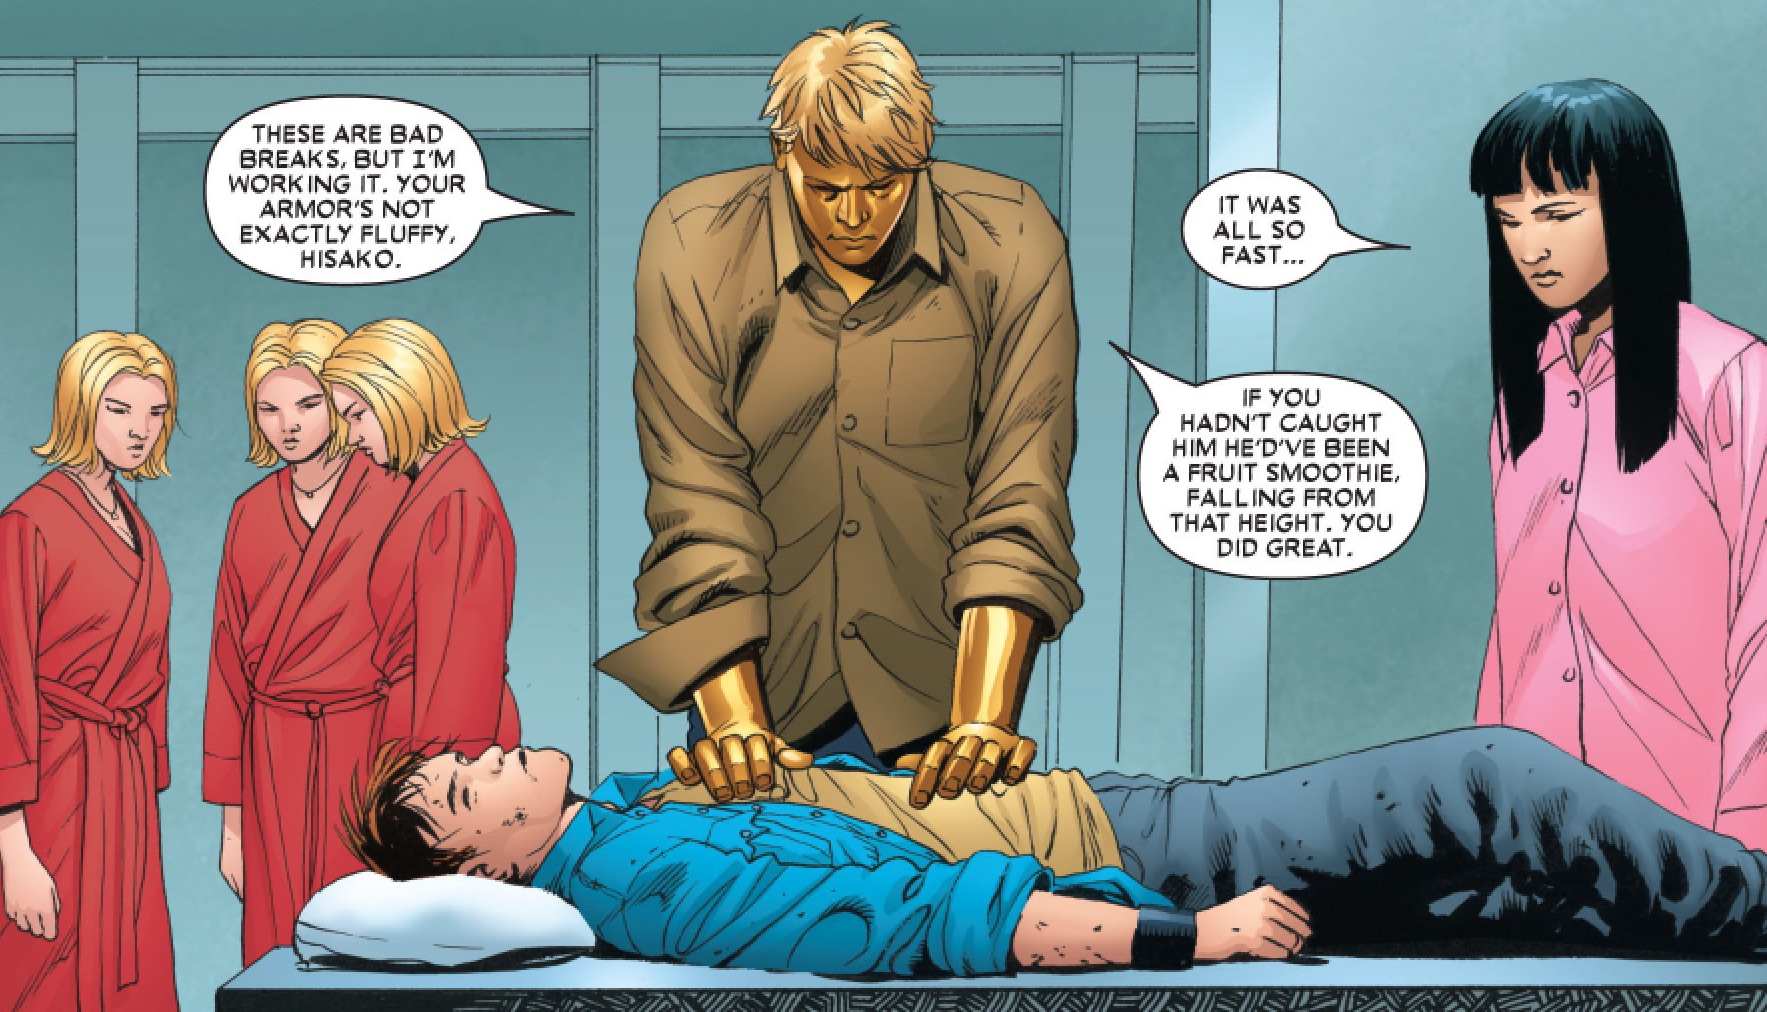 Edward Tancredi (Earth-616), Hisako Ichiki (Earth-616), Joshua Foley (Earth-616) and Stepford Cuckoos (Earth-616) from Astonishing X-Men Vol 3 5 001.jpg